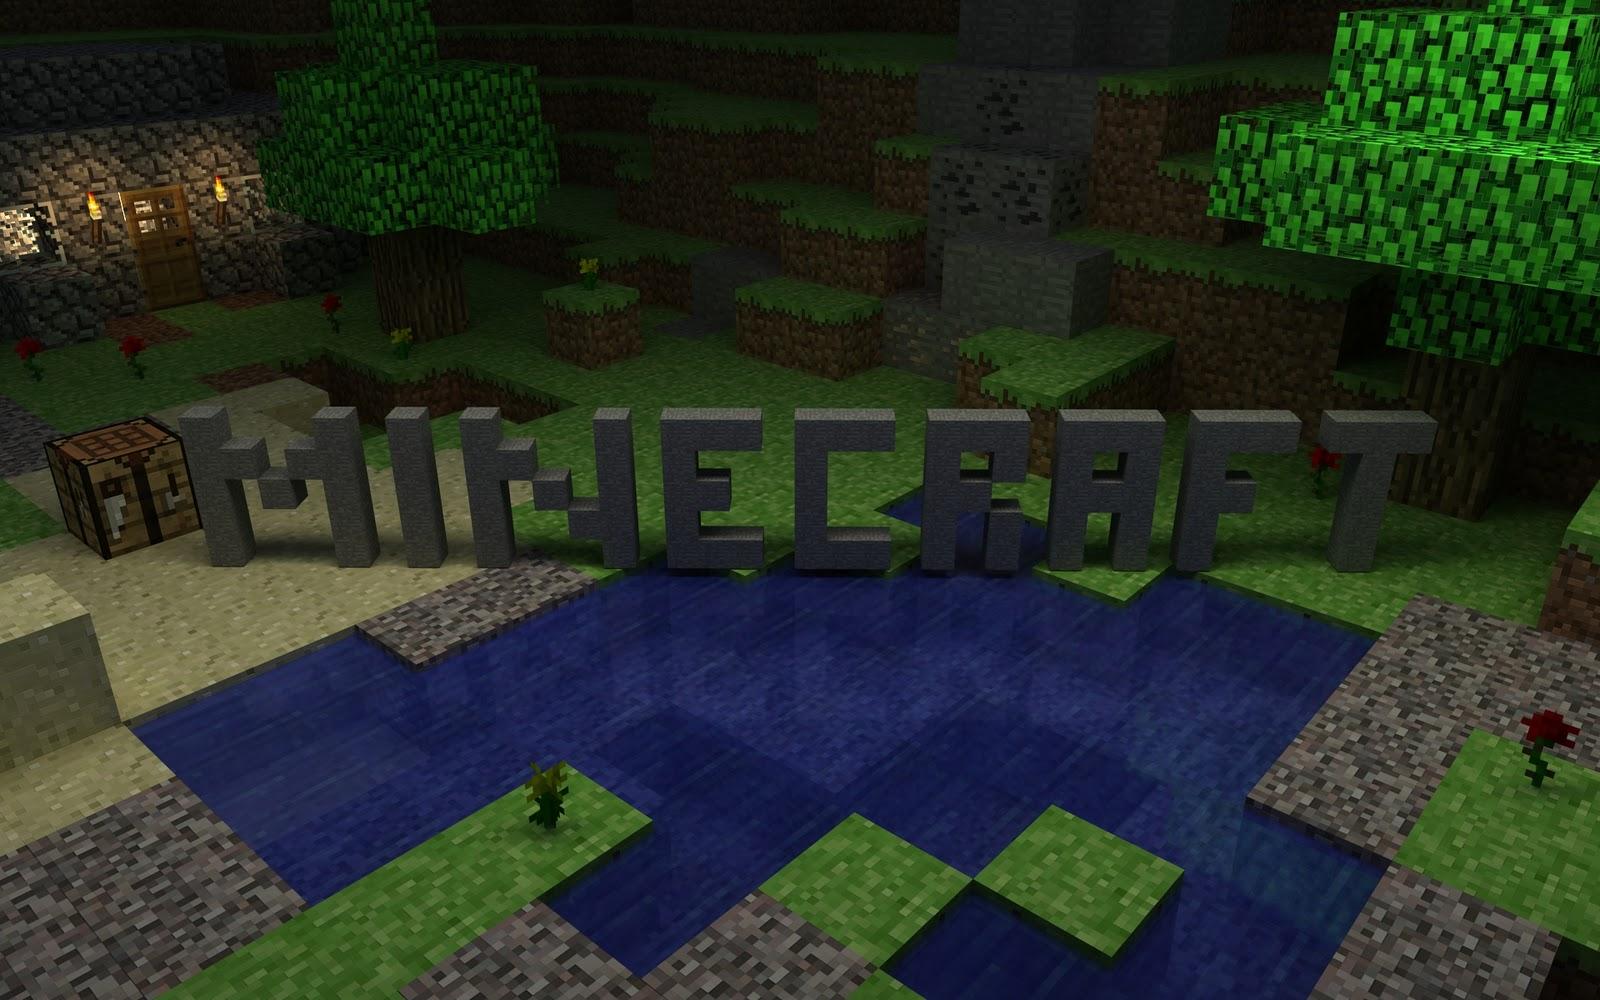 Minecraft Fondo De Pantalla Hd: Wallpapers De Minecraft